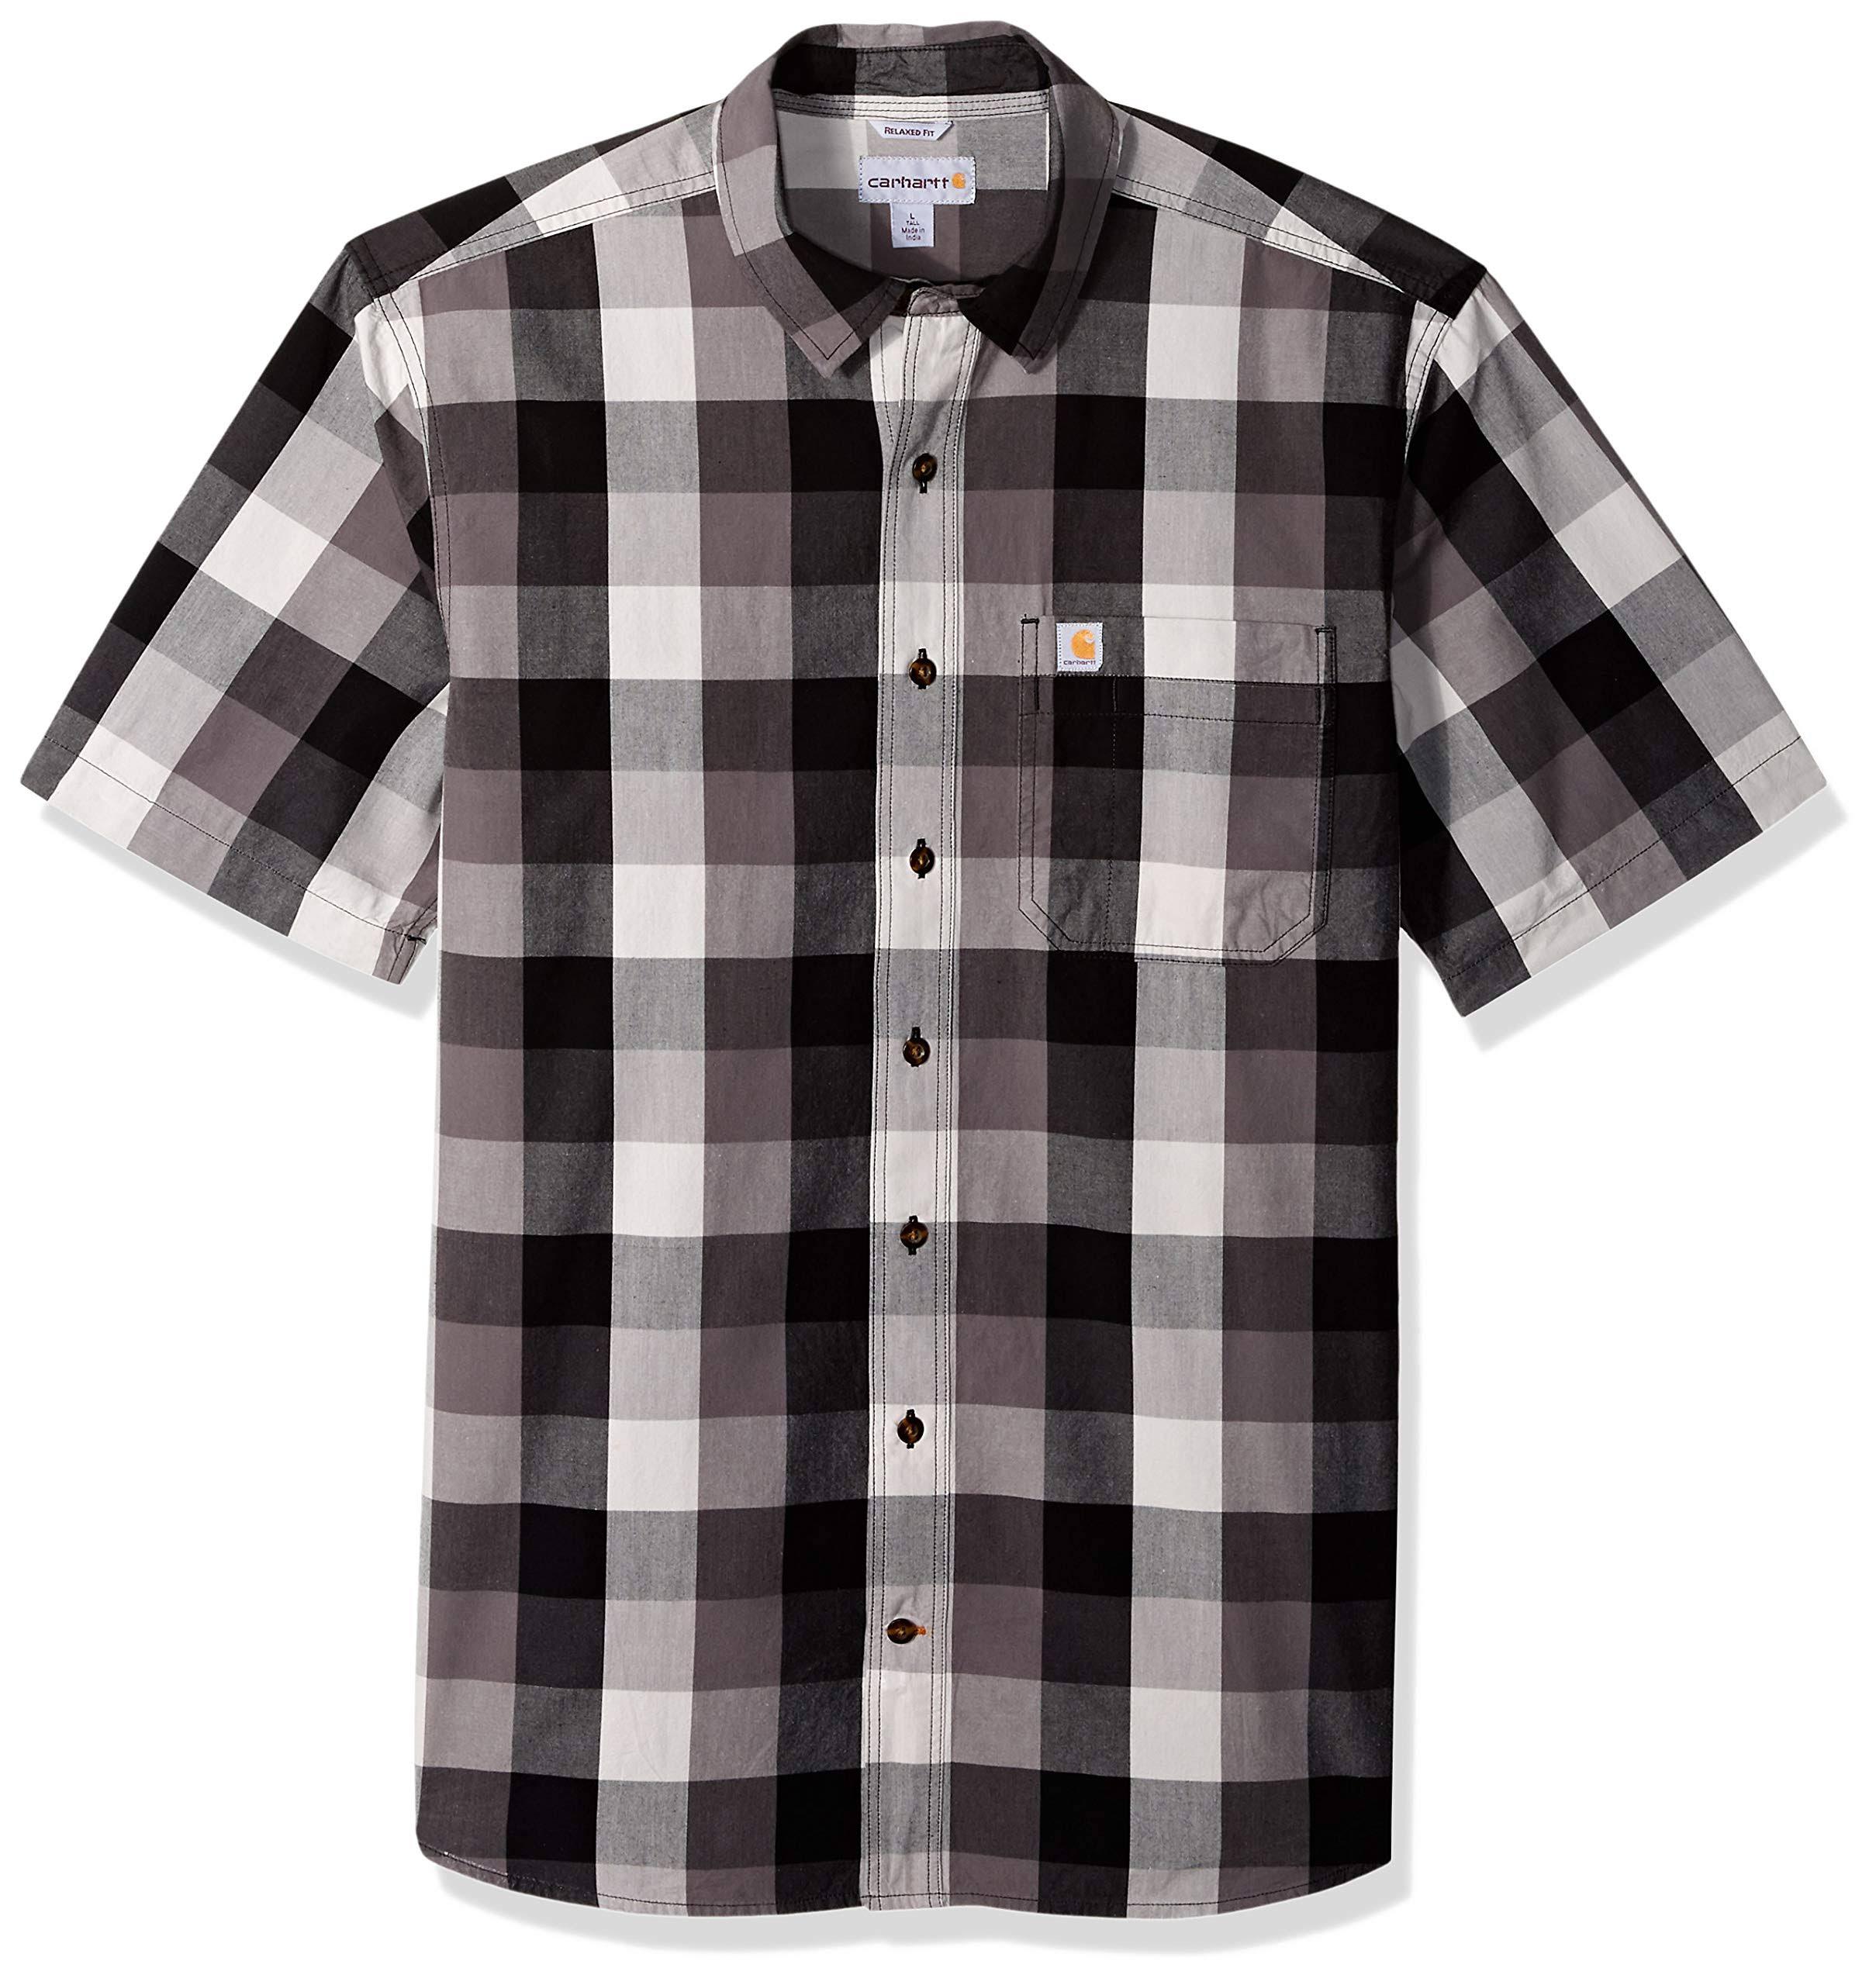 Manga Plaid Camisa Cuello Abierto Regular Para Hombre Carhartt Con Essential Corta De RqR5wO70